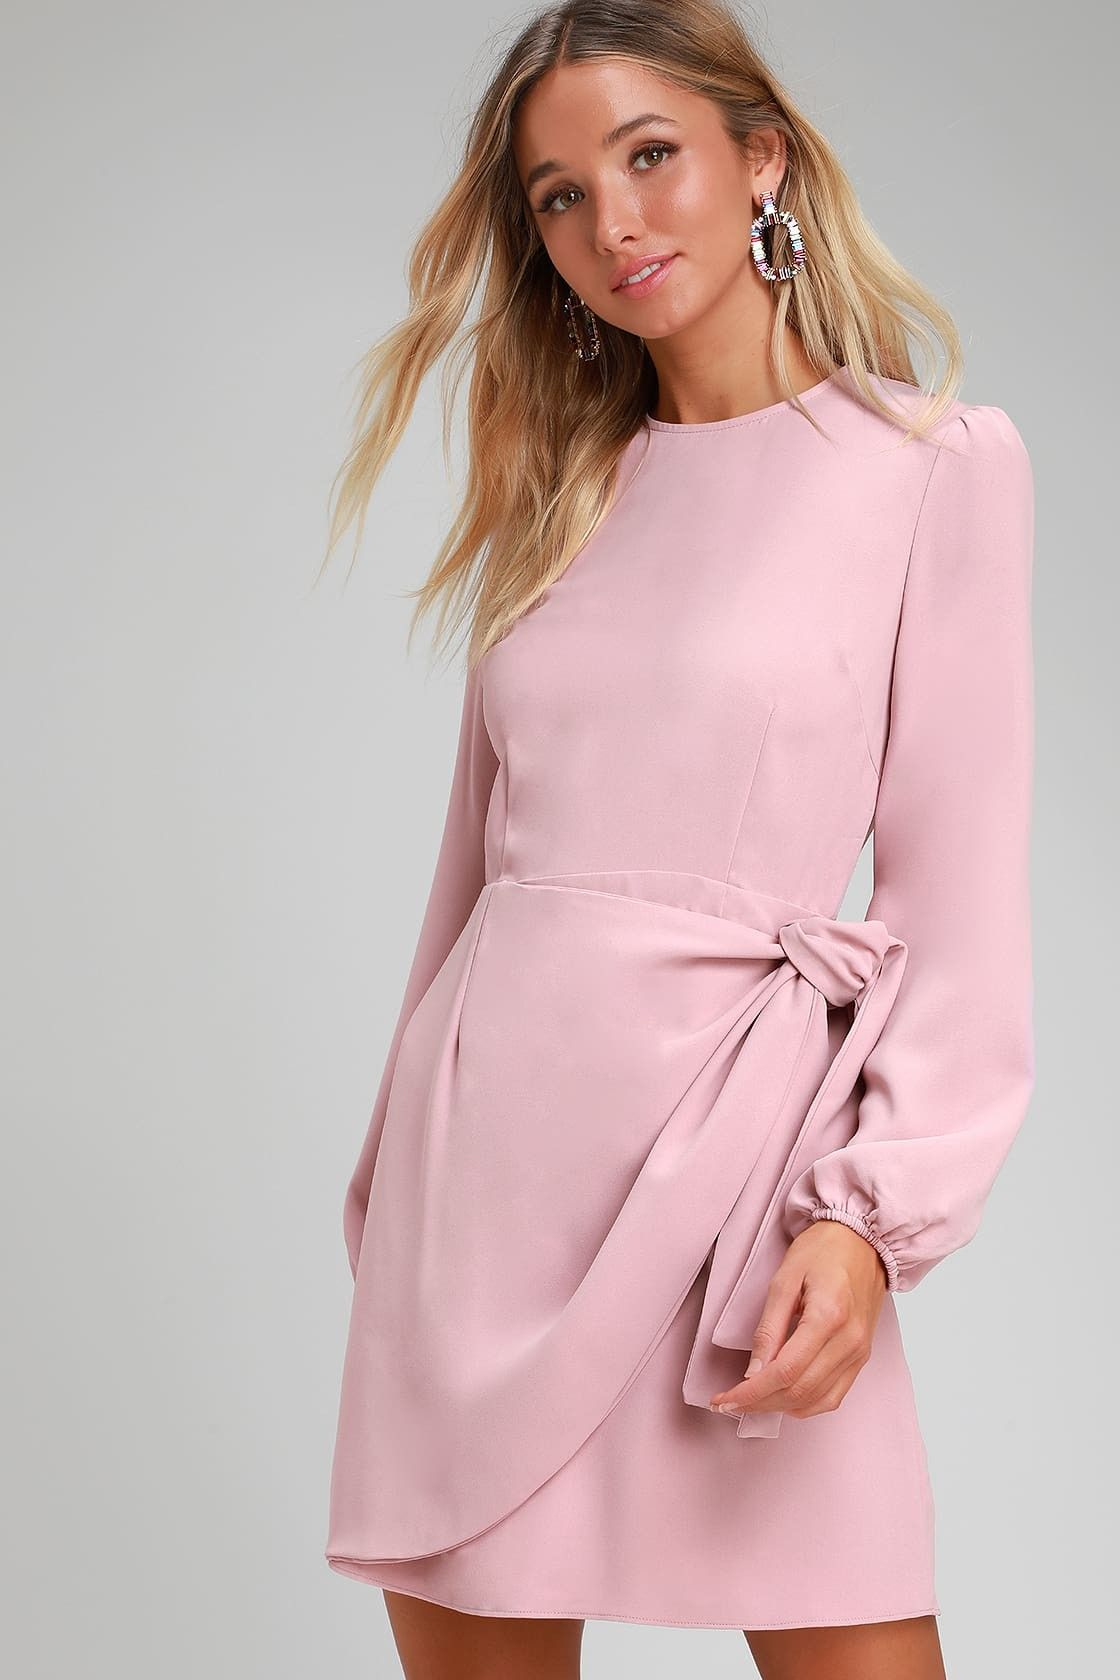 Pink Long Sleeve Tie Front Skater Dress Affiliate Link Springwedding Weddingguest In 2021 Long Sleeve Skater Dress Mini Dress With Sleeves Hot Pink Dresses [ 1680 x 1120 Pixel ]